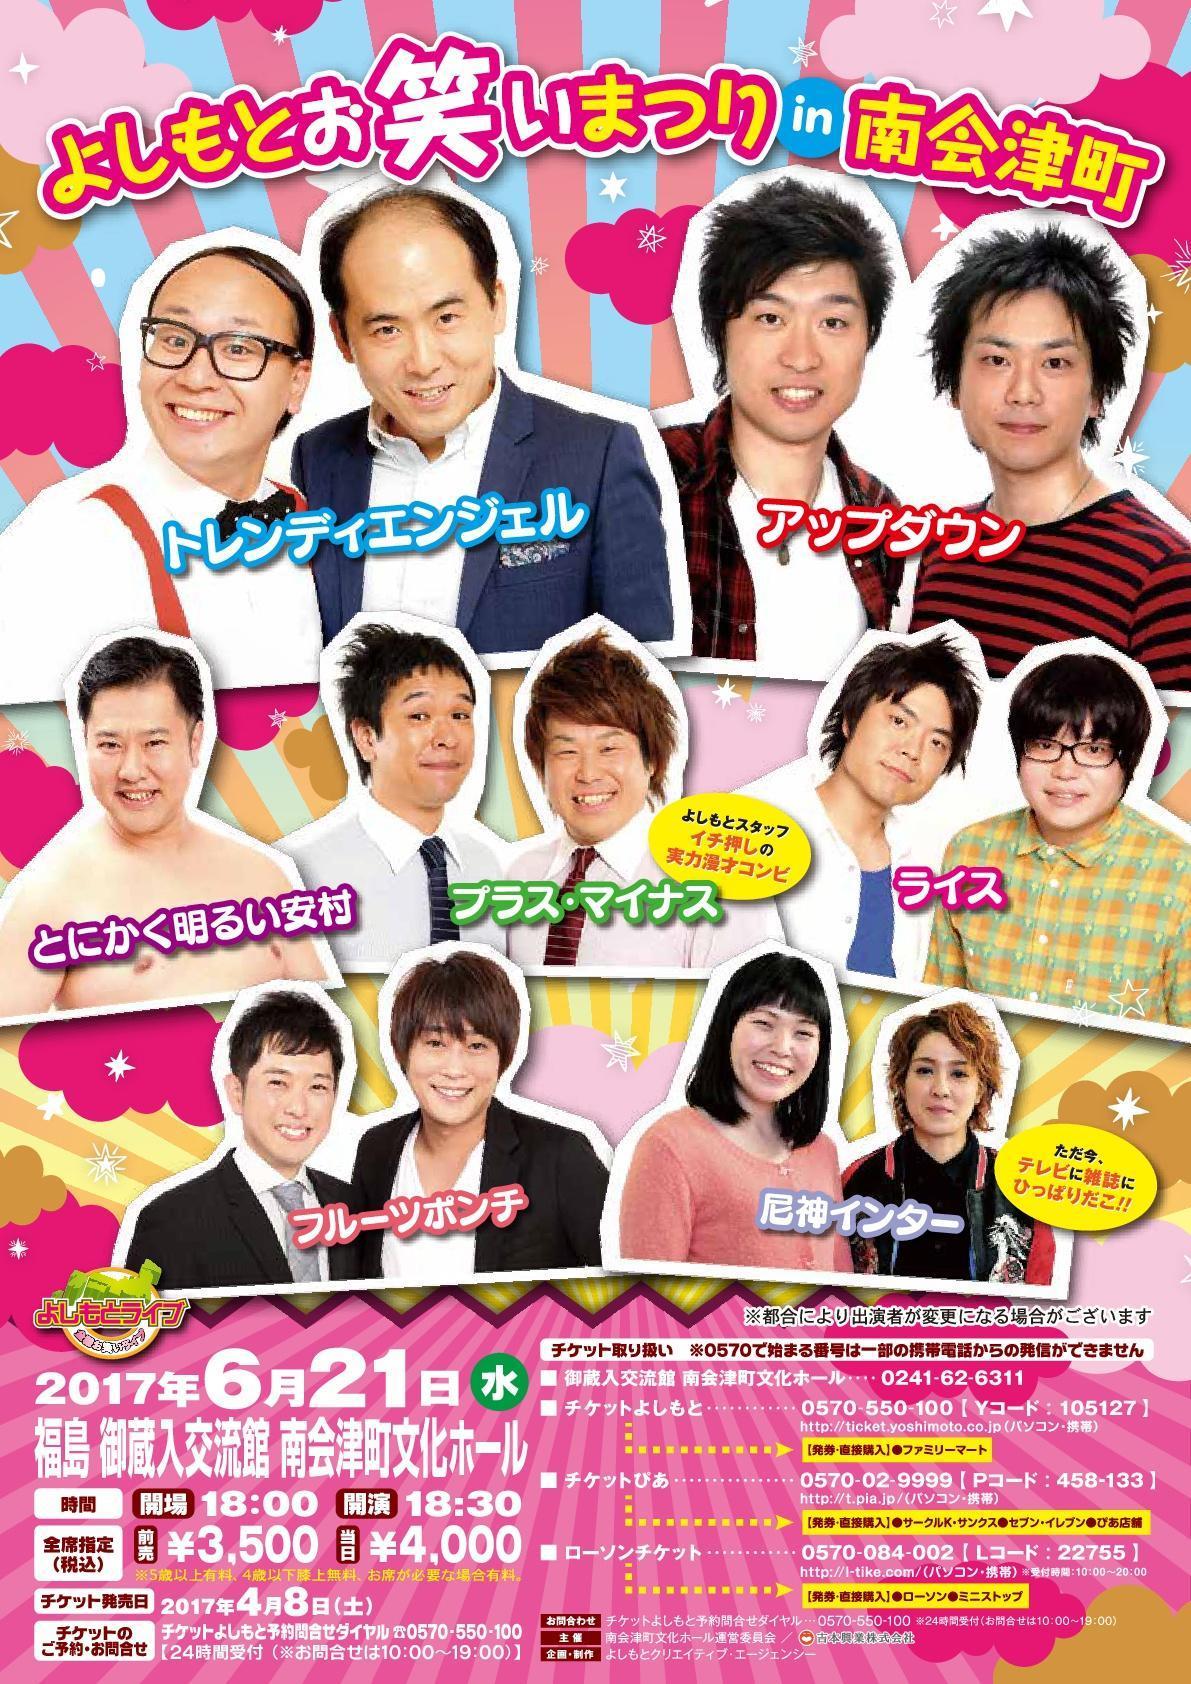 http://www.syumatsu.jp/20170329211733-58c23a7d0cfb6af89b1cf9b83817e5d0a6a8606c.jpg